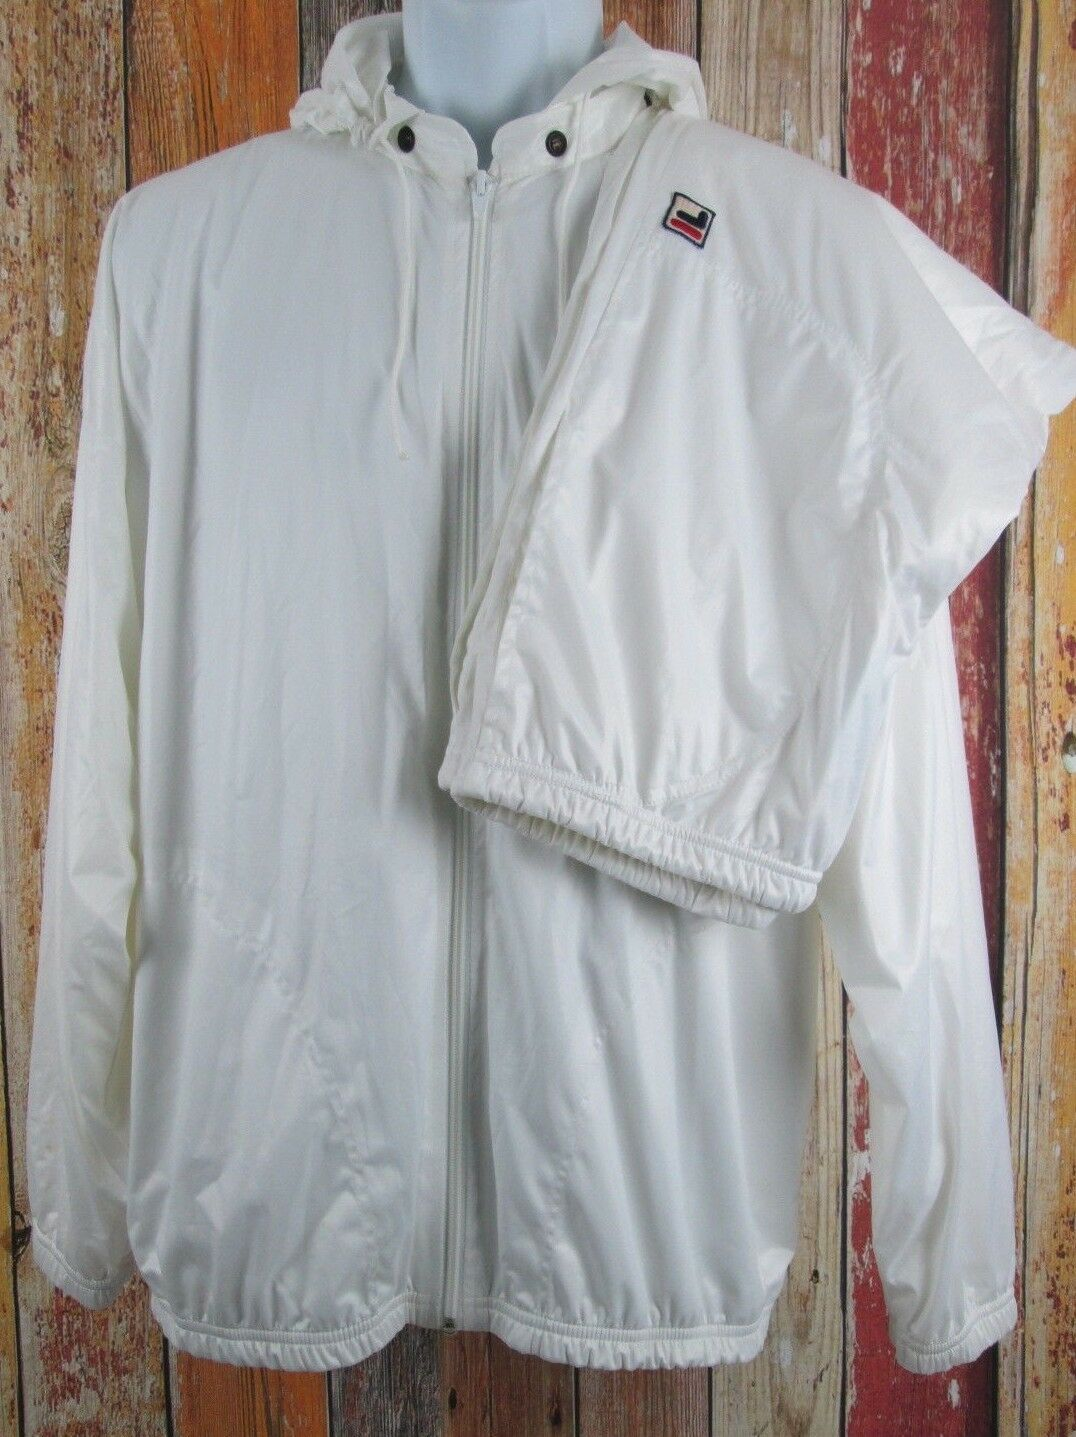 Vintage 80er Jahre Balance Nwt Fila Retro Joggen Trainingsanzug Größe 42  | Preisreduktion